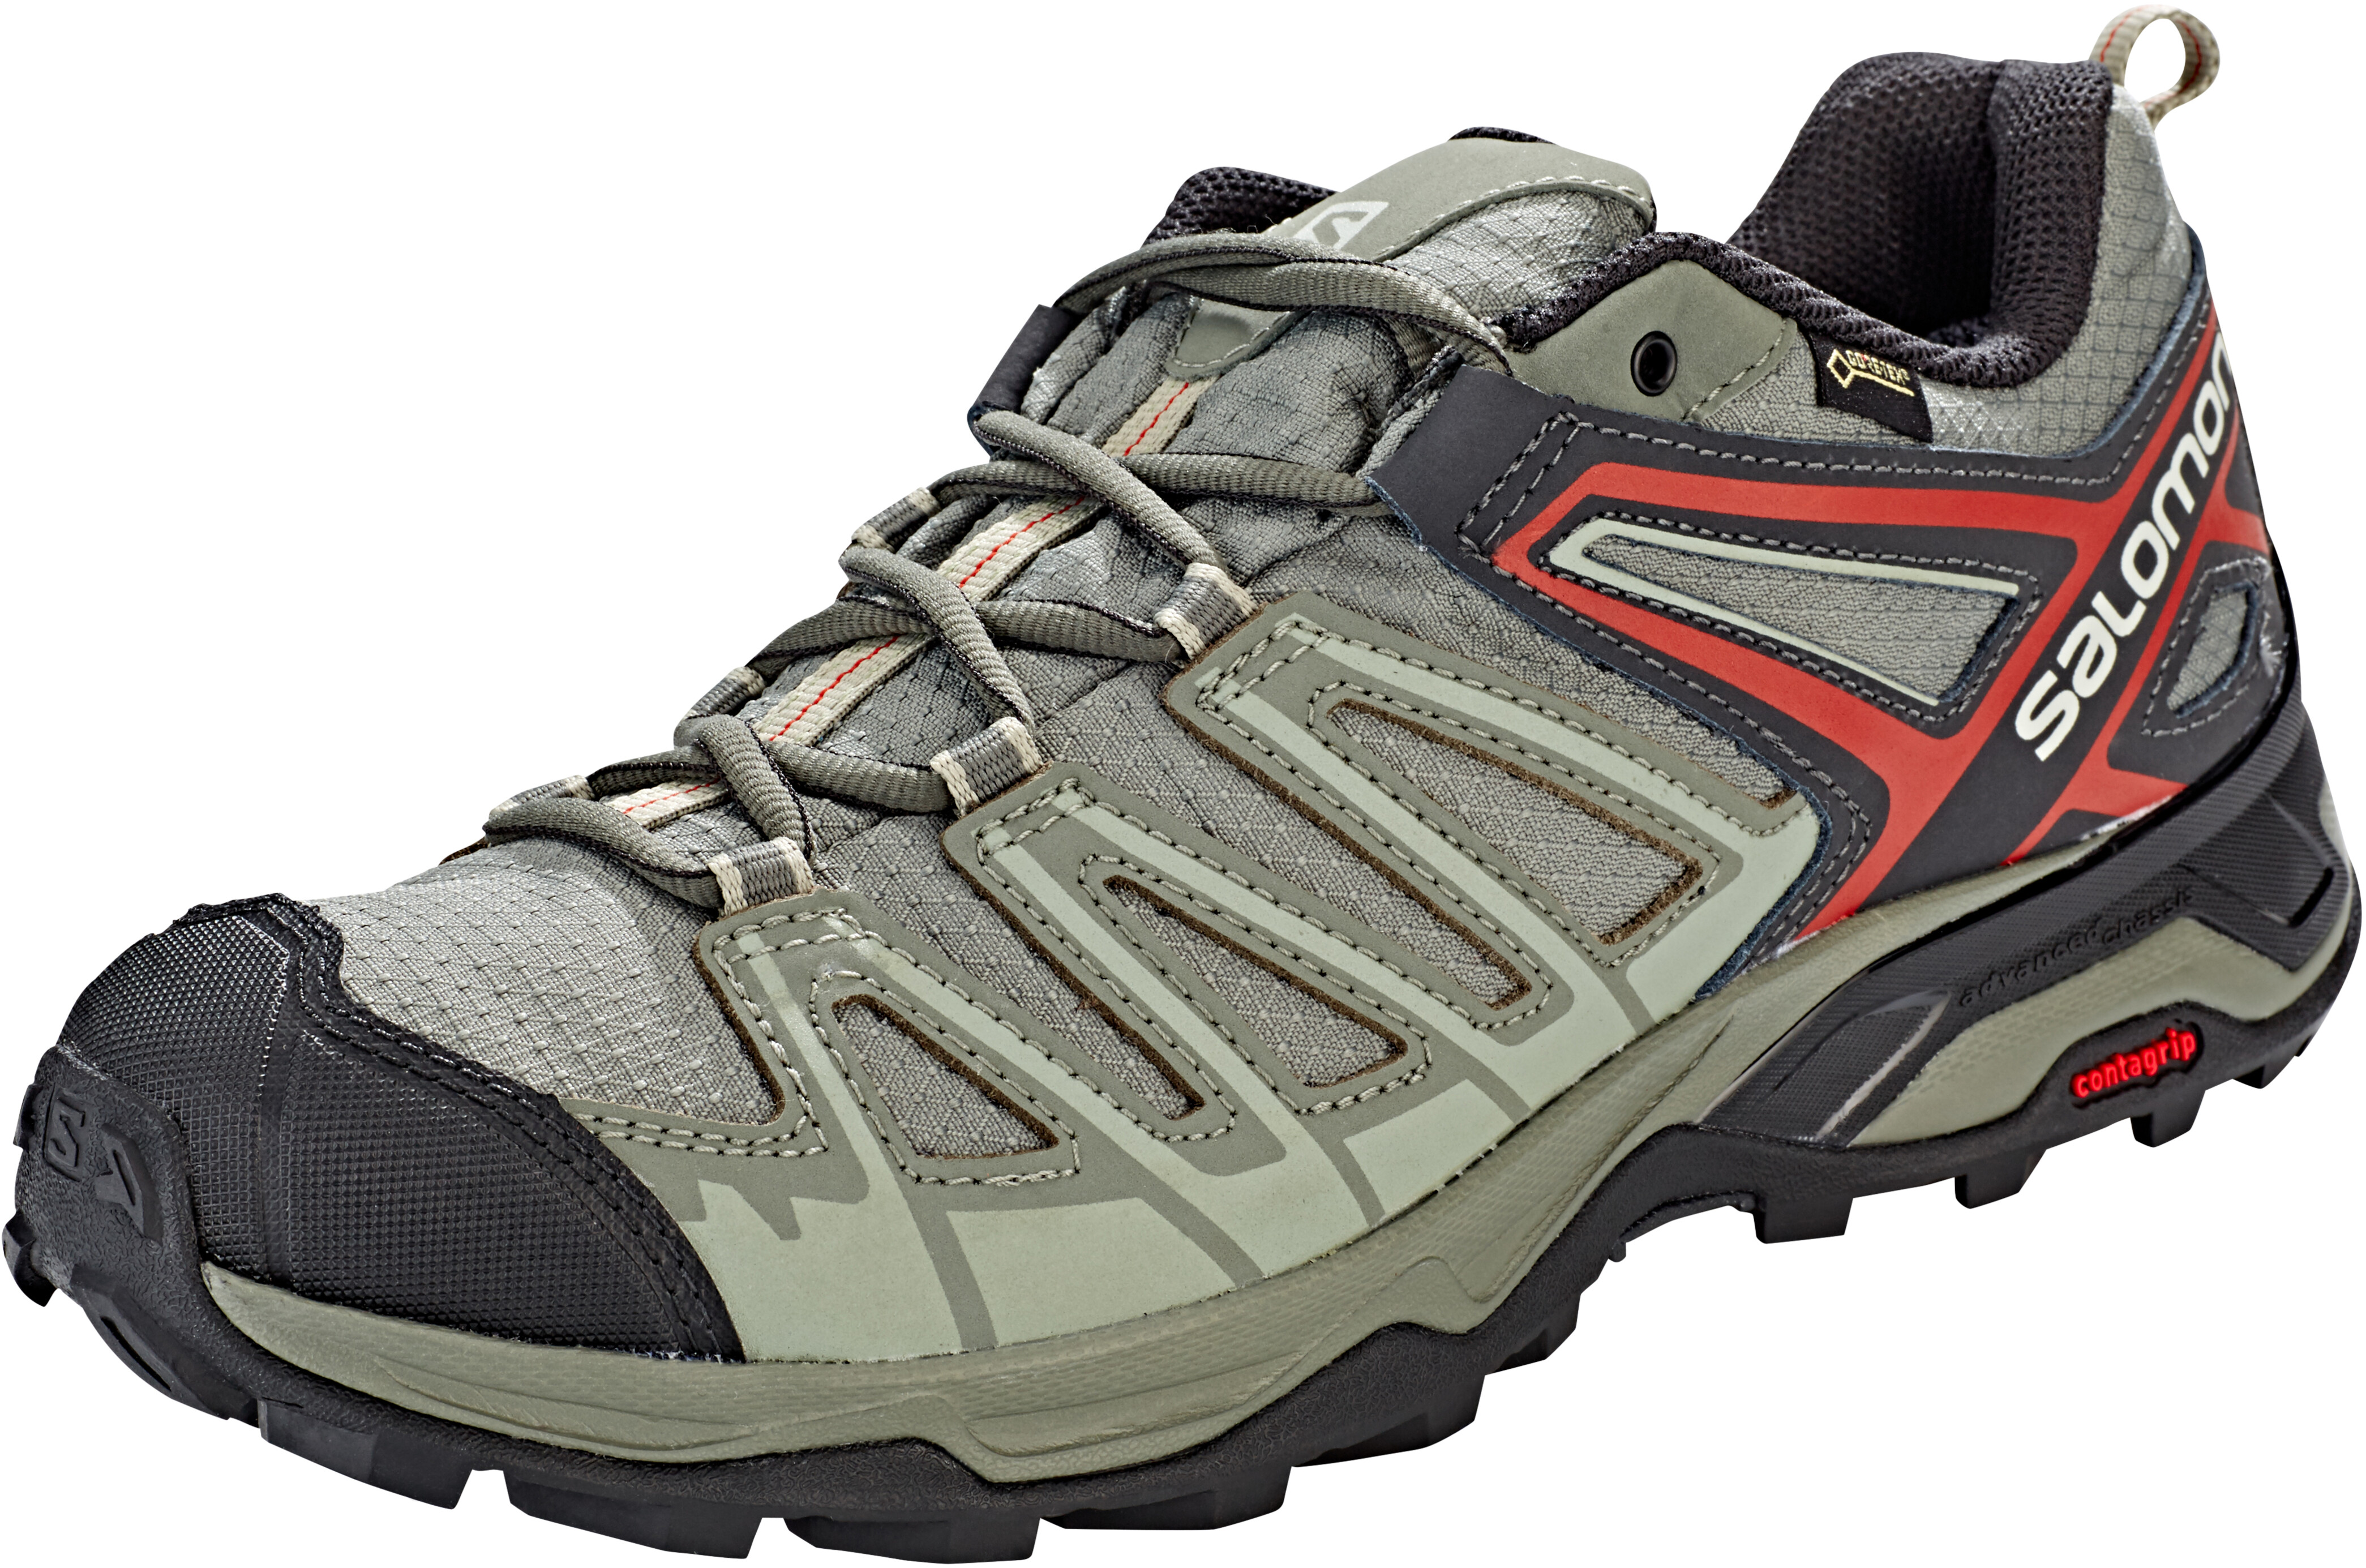 la meilleure attitude c22fb 1f307 Salomon X Ultra 3 Prime GTX Shoes Men castor gray/shadow/bossa nova